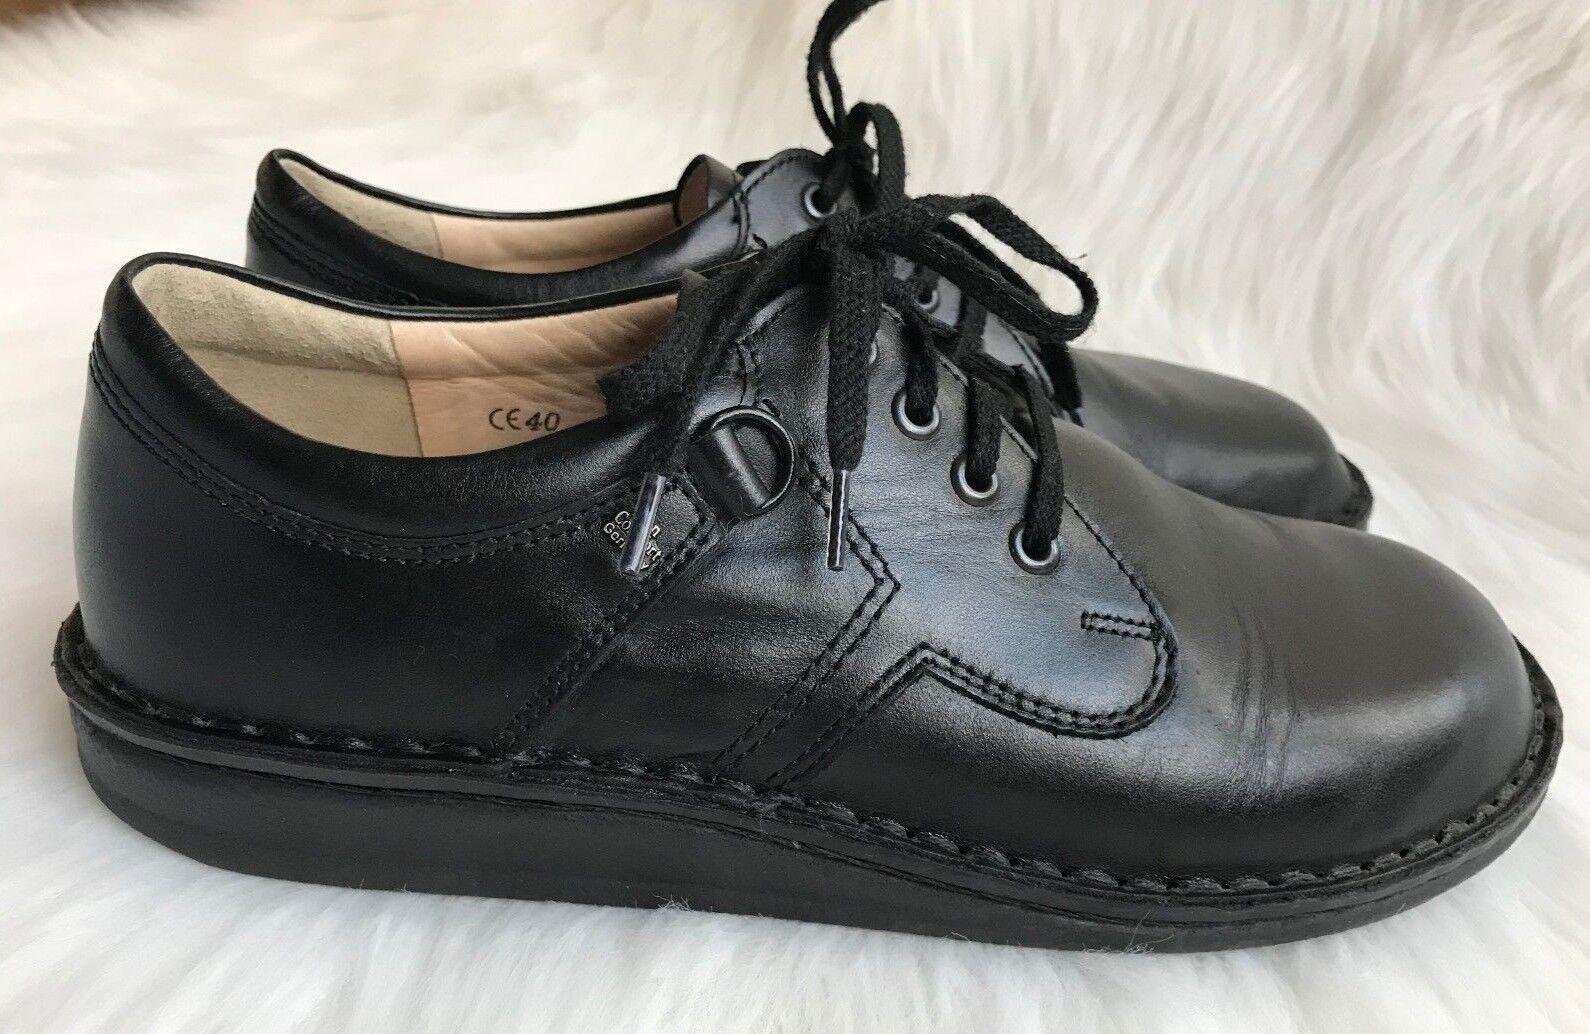 Men'sFinn Comfort Vaasa Black Leather Lace-Up Oxford shoes Sz EU 40 (US 7-7.5)